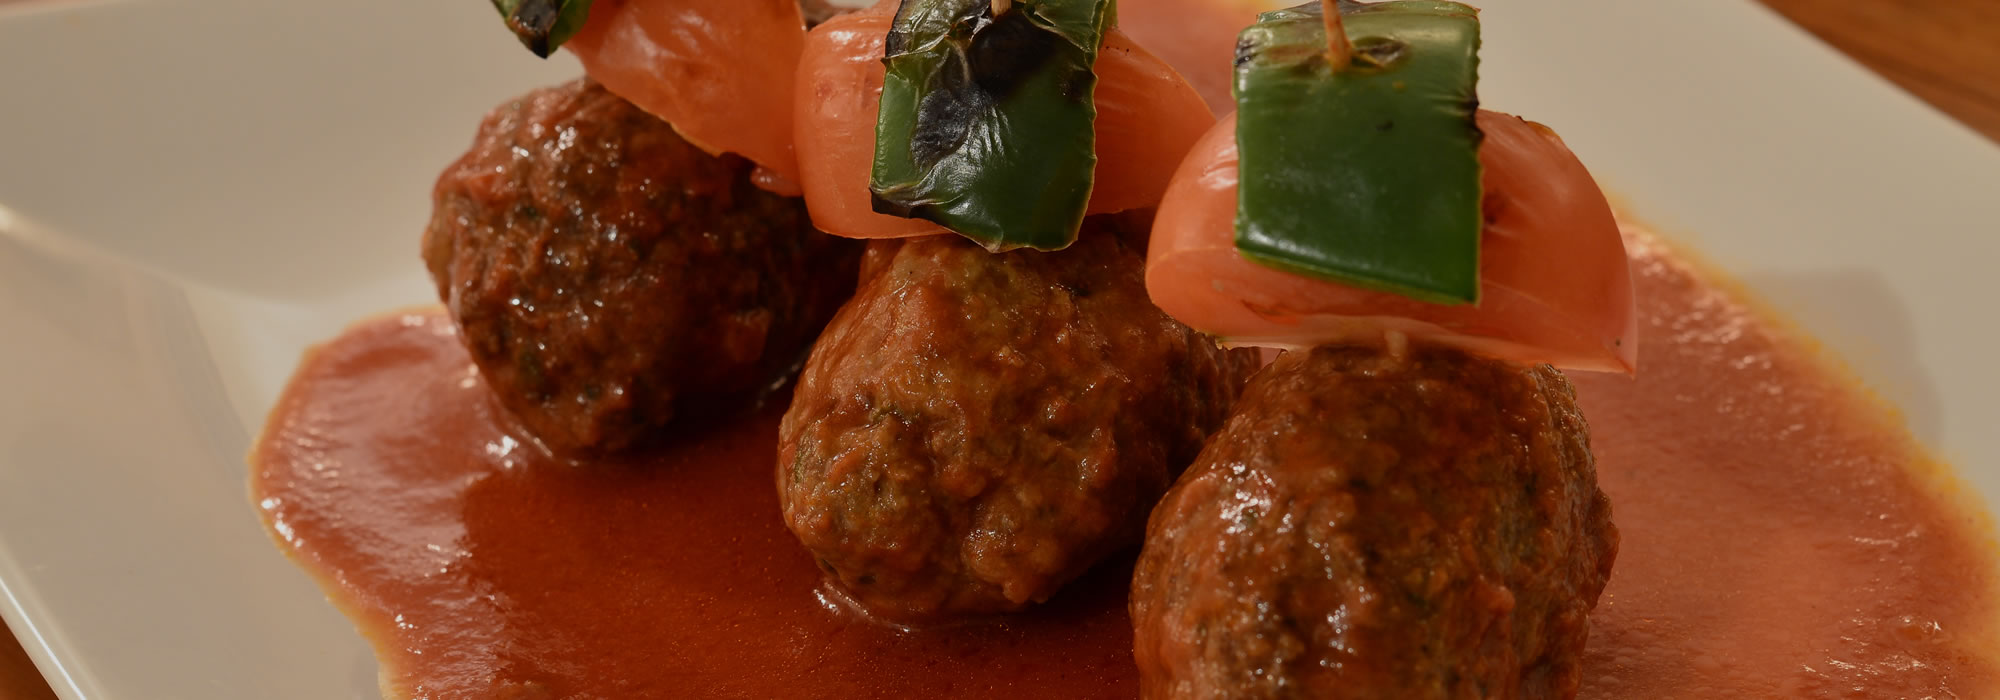 header-meatballs